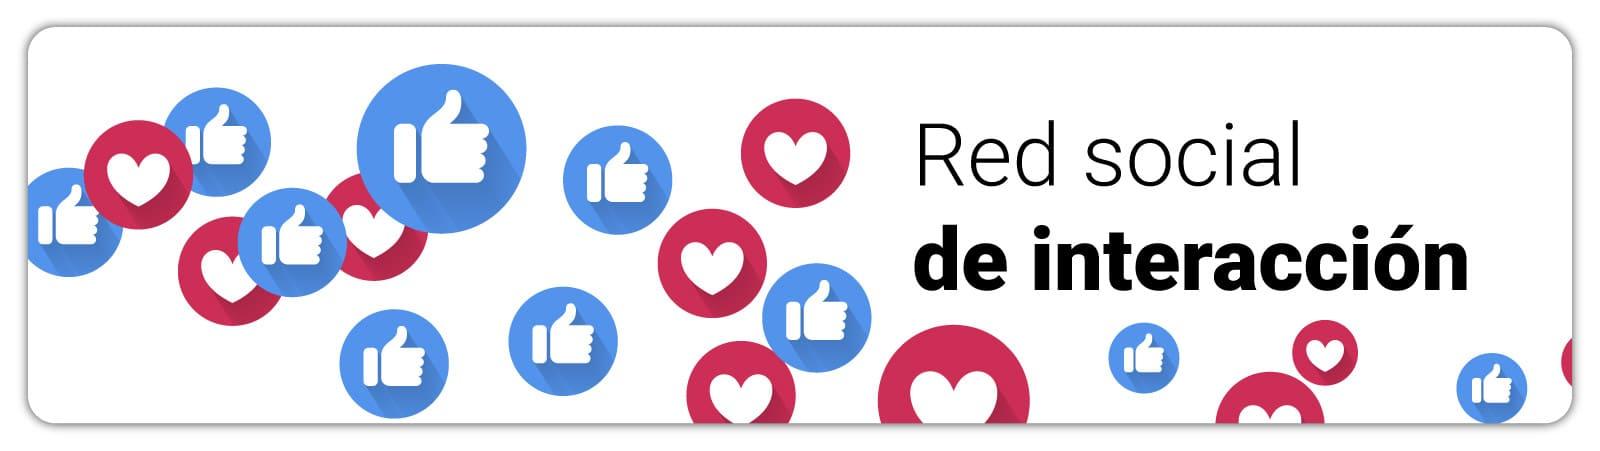 art-02-Red-social-de-interaccion1